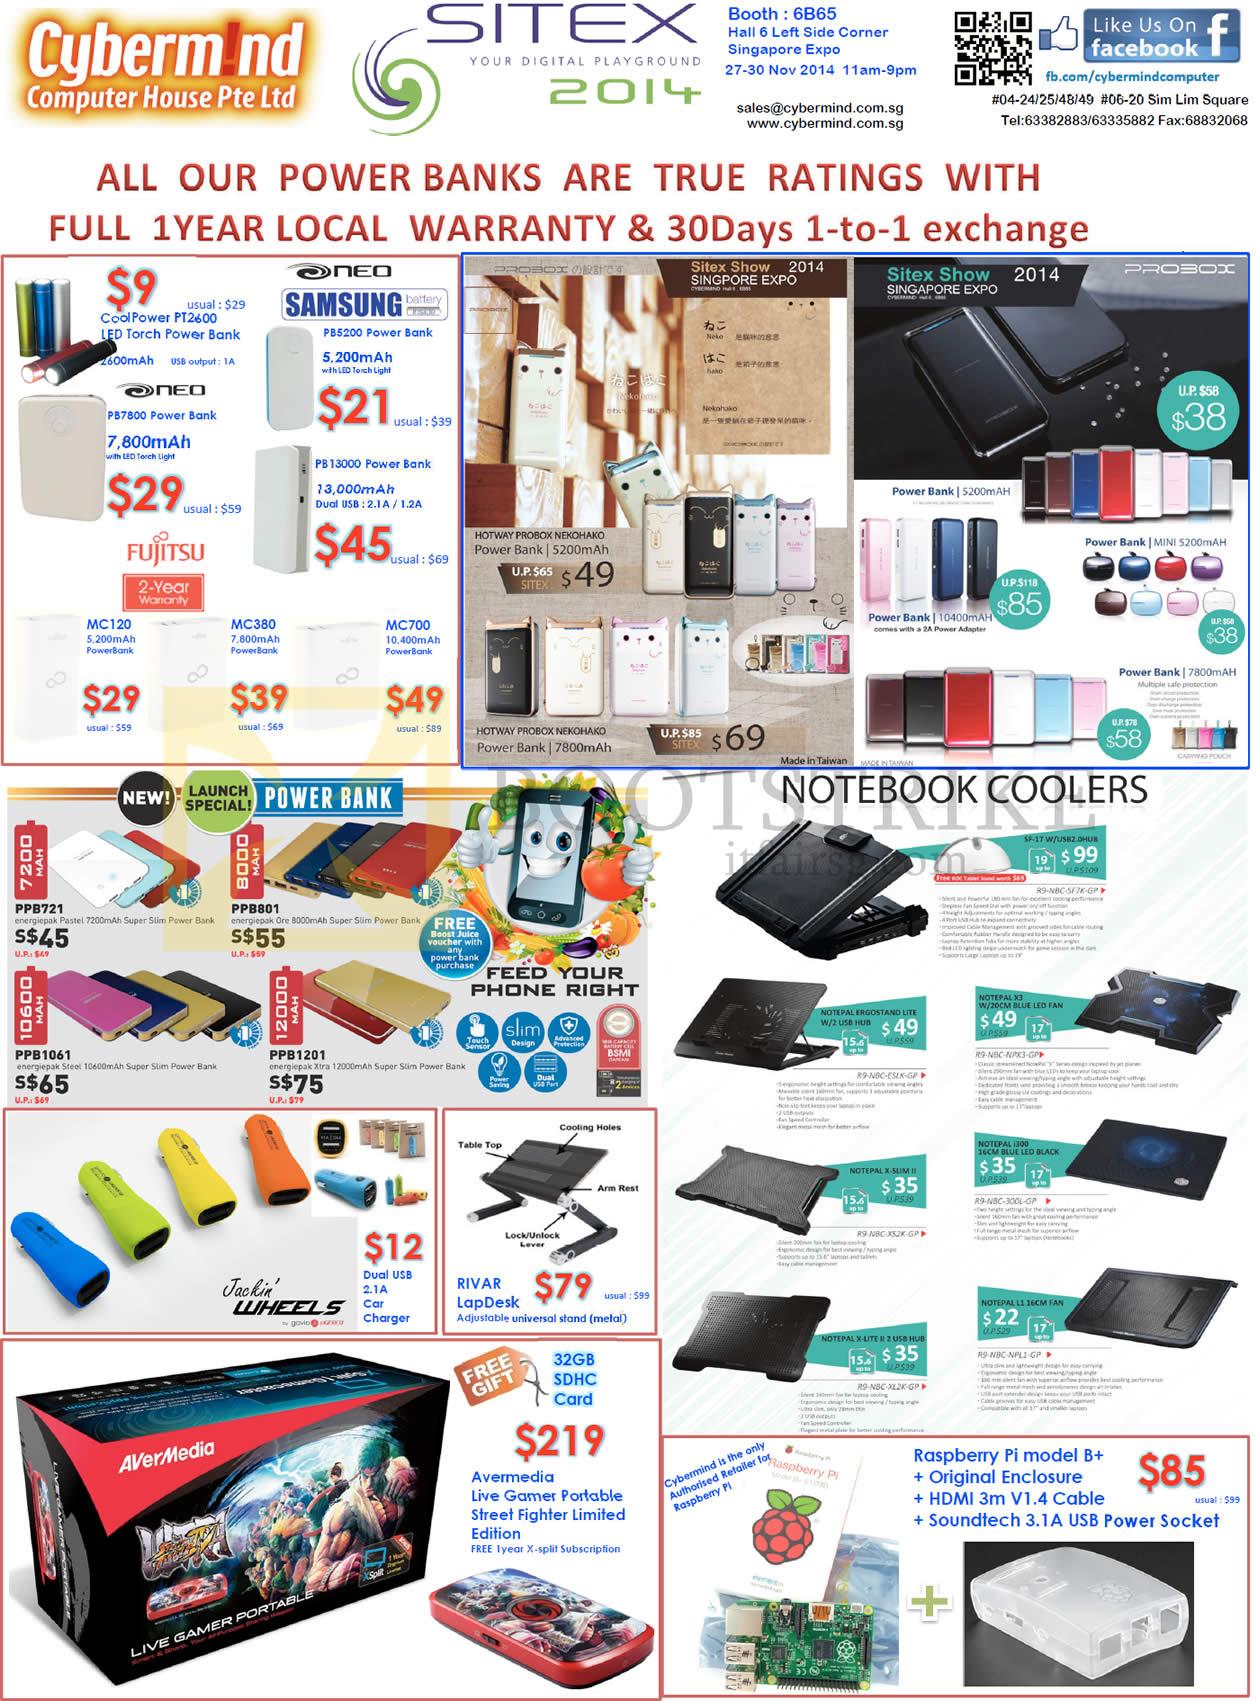 SITEX 2014 price list image brochure of Cybermind Power Banks Samsung Neo, Fujitsu, Probox, Cooler Master, Jackin Wheels, Avermedia Live Gamer Portable Street Fighter Edition, Raspberry PI